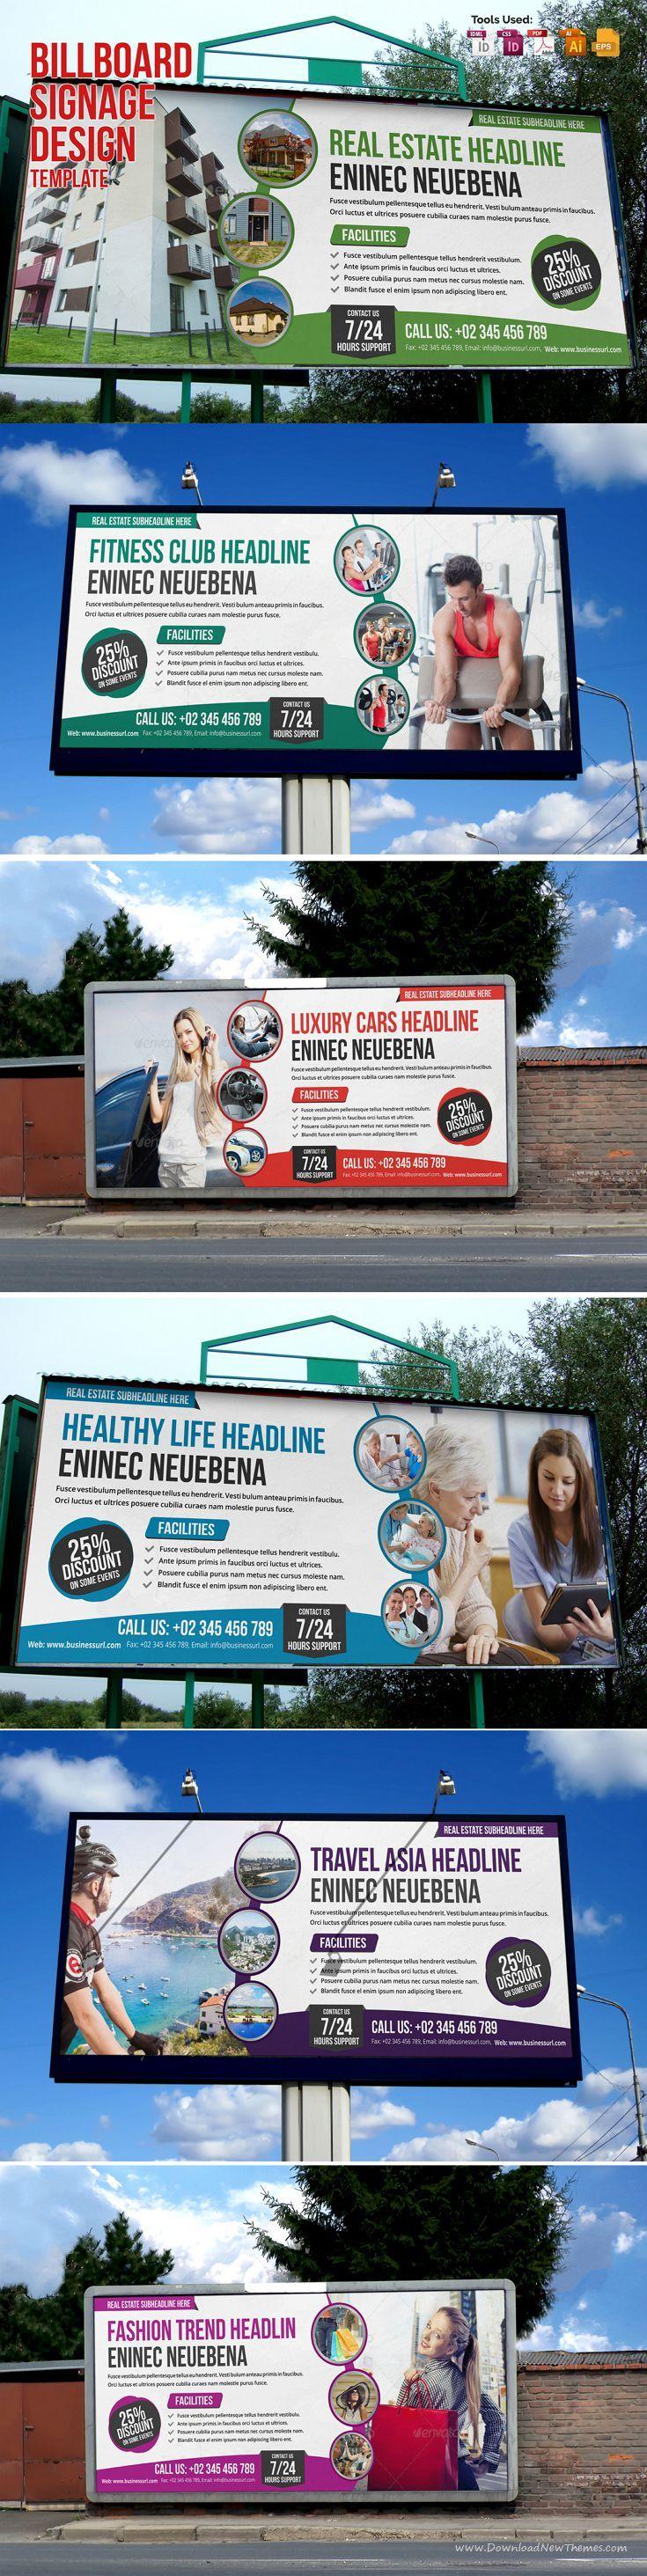 Real estate billboard design samples - 6 Creative Modern Multipurpose Billboard Signage Template Ready To Use